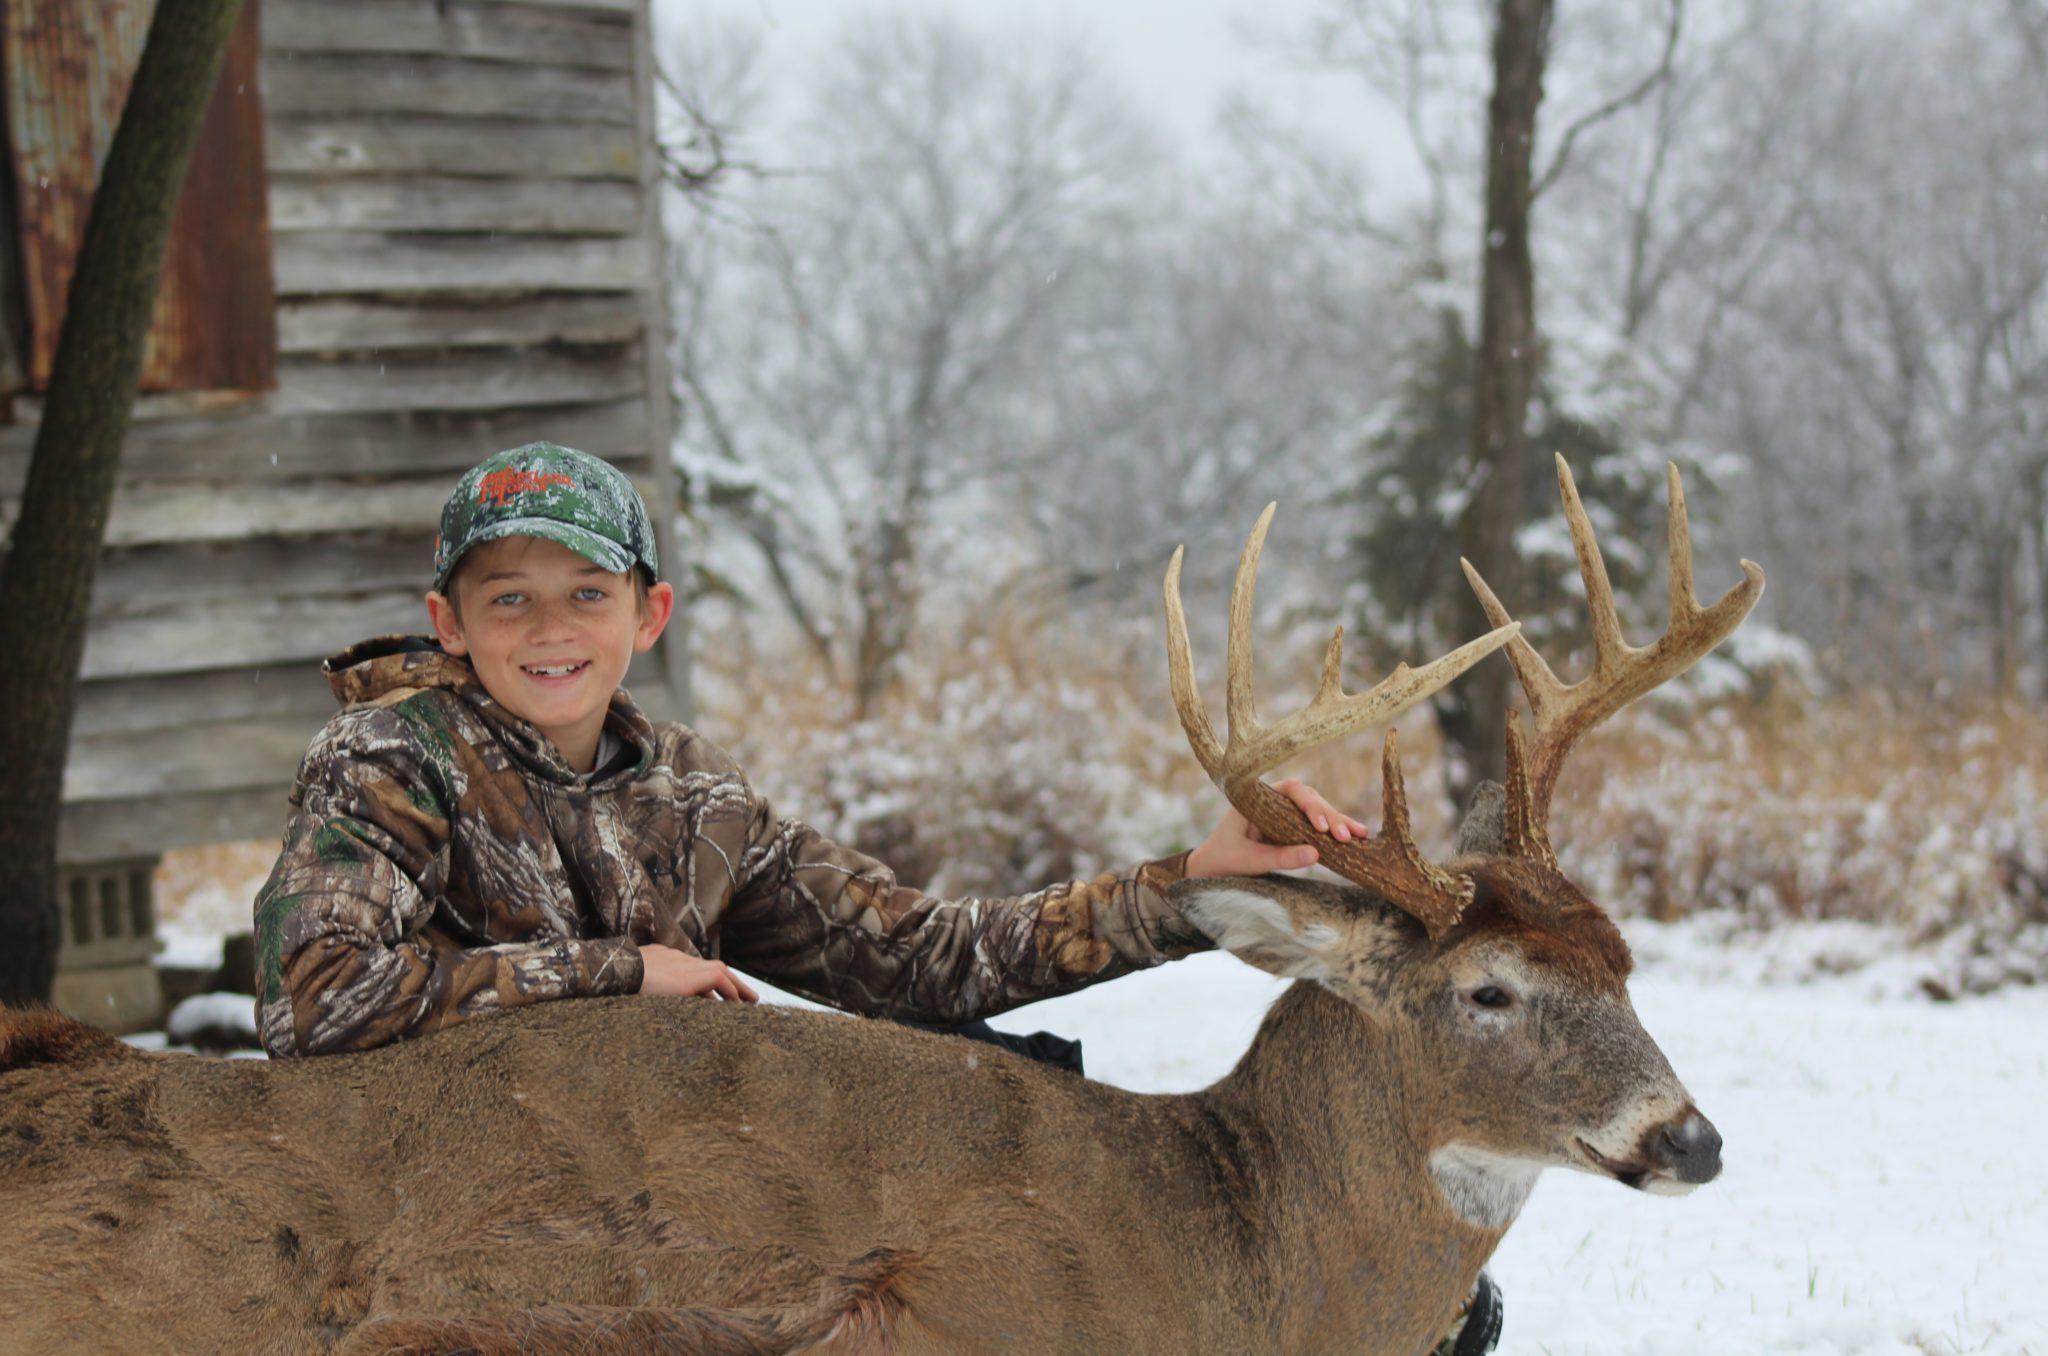 Late Season Whitetail Hunting: Illinois Late Deer Hunts